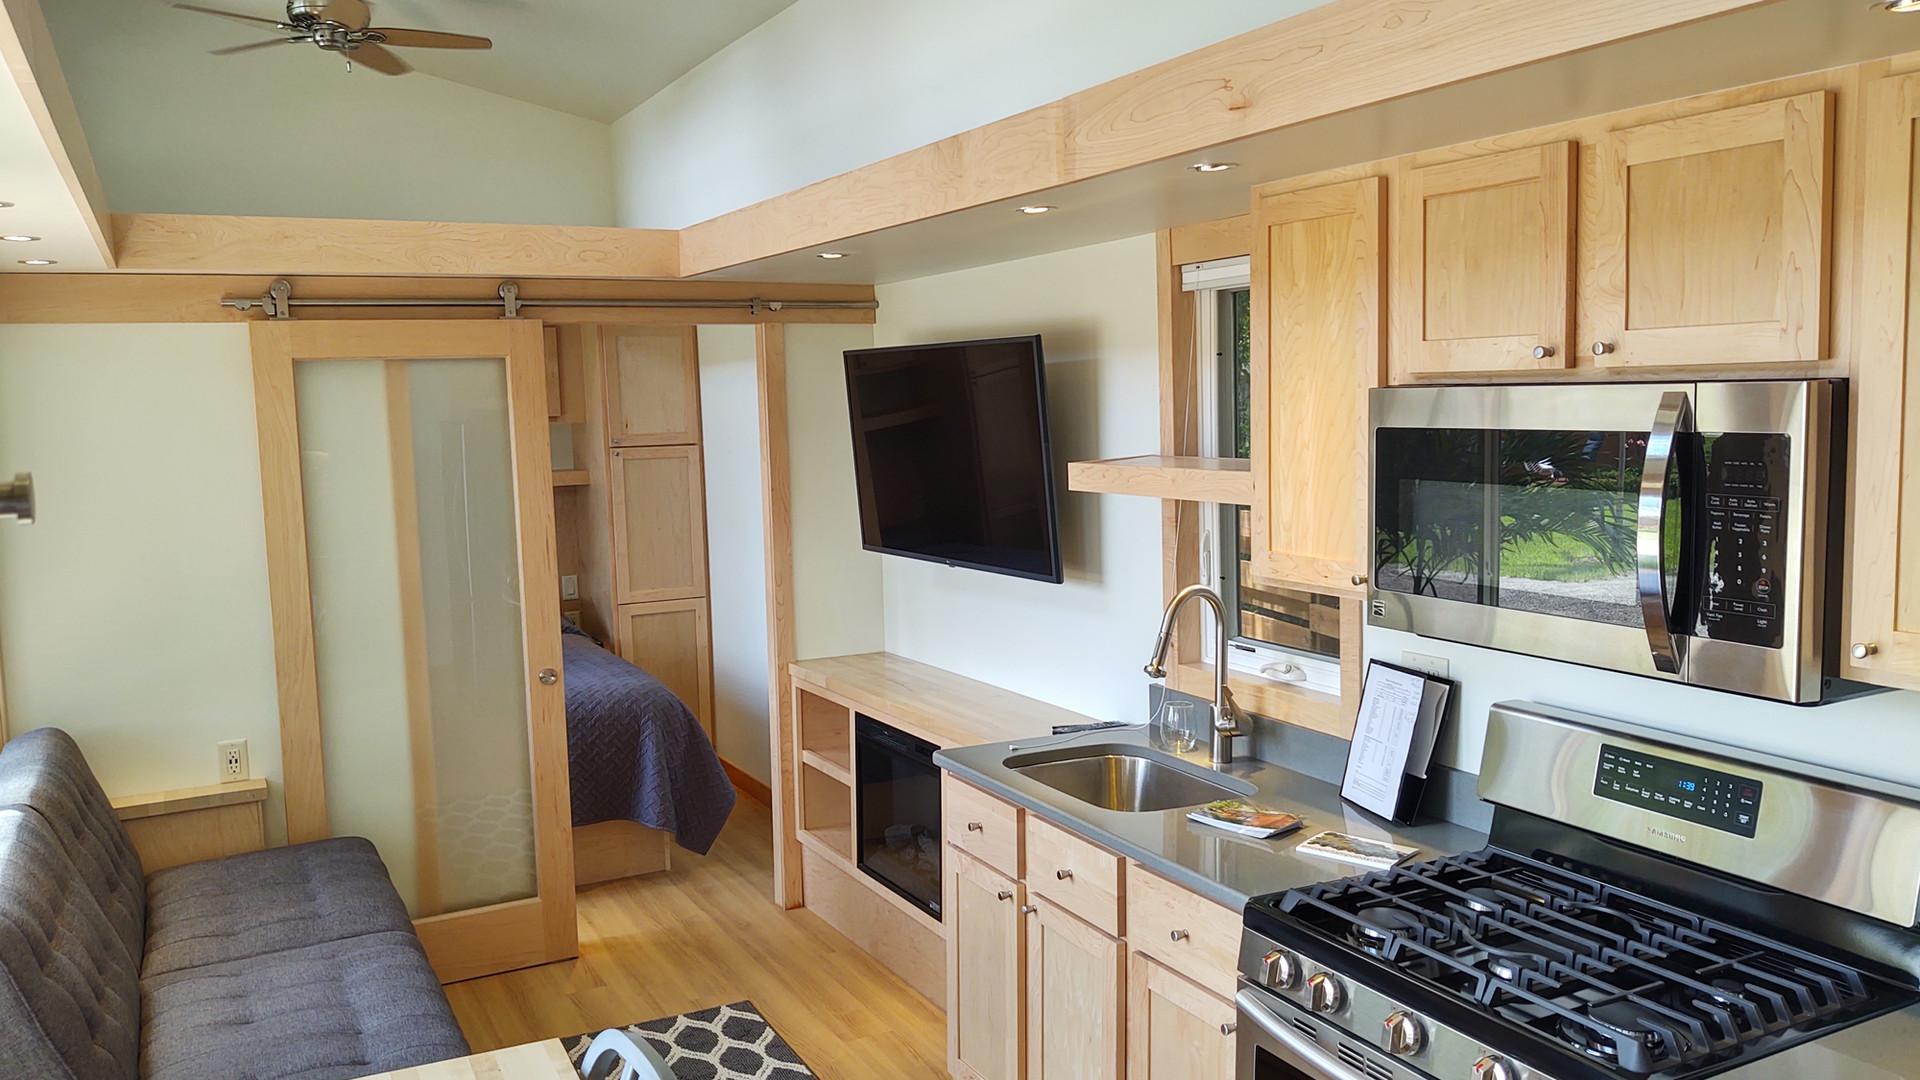 Smart TV + Fireplace